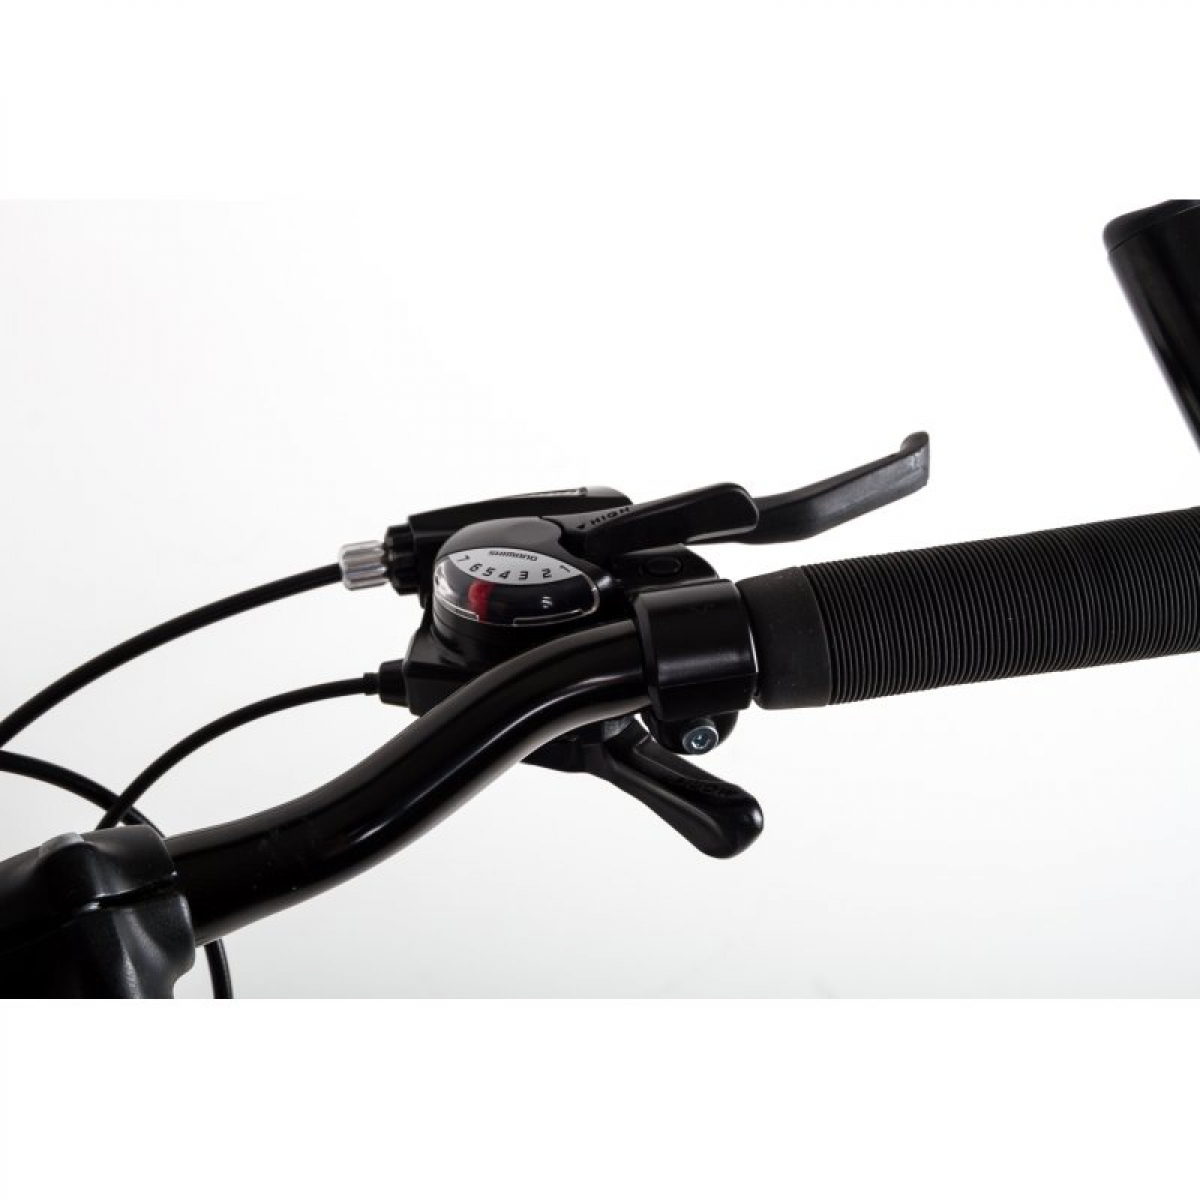 26 zoll mtb cross fahrrad bike shimano 21 gang stvzo disc racing design ihr fahrrad online. Black Bedroom Furniture Sets. Home Design Ideas